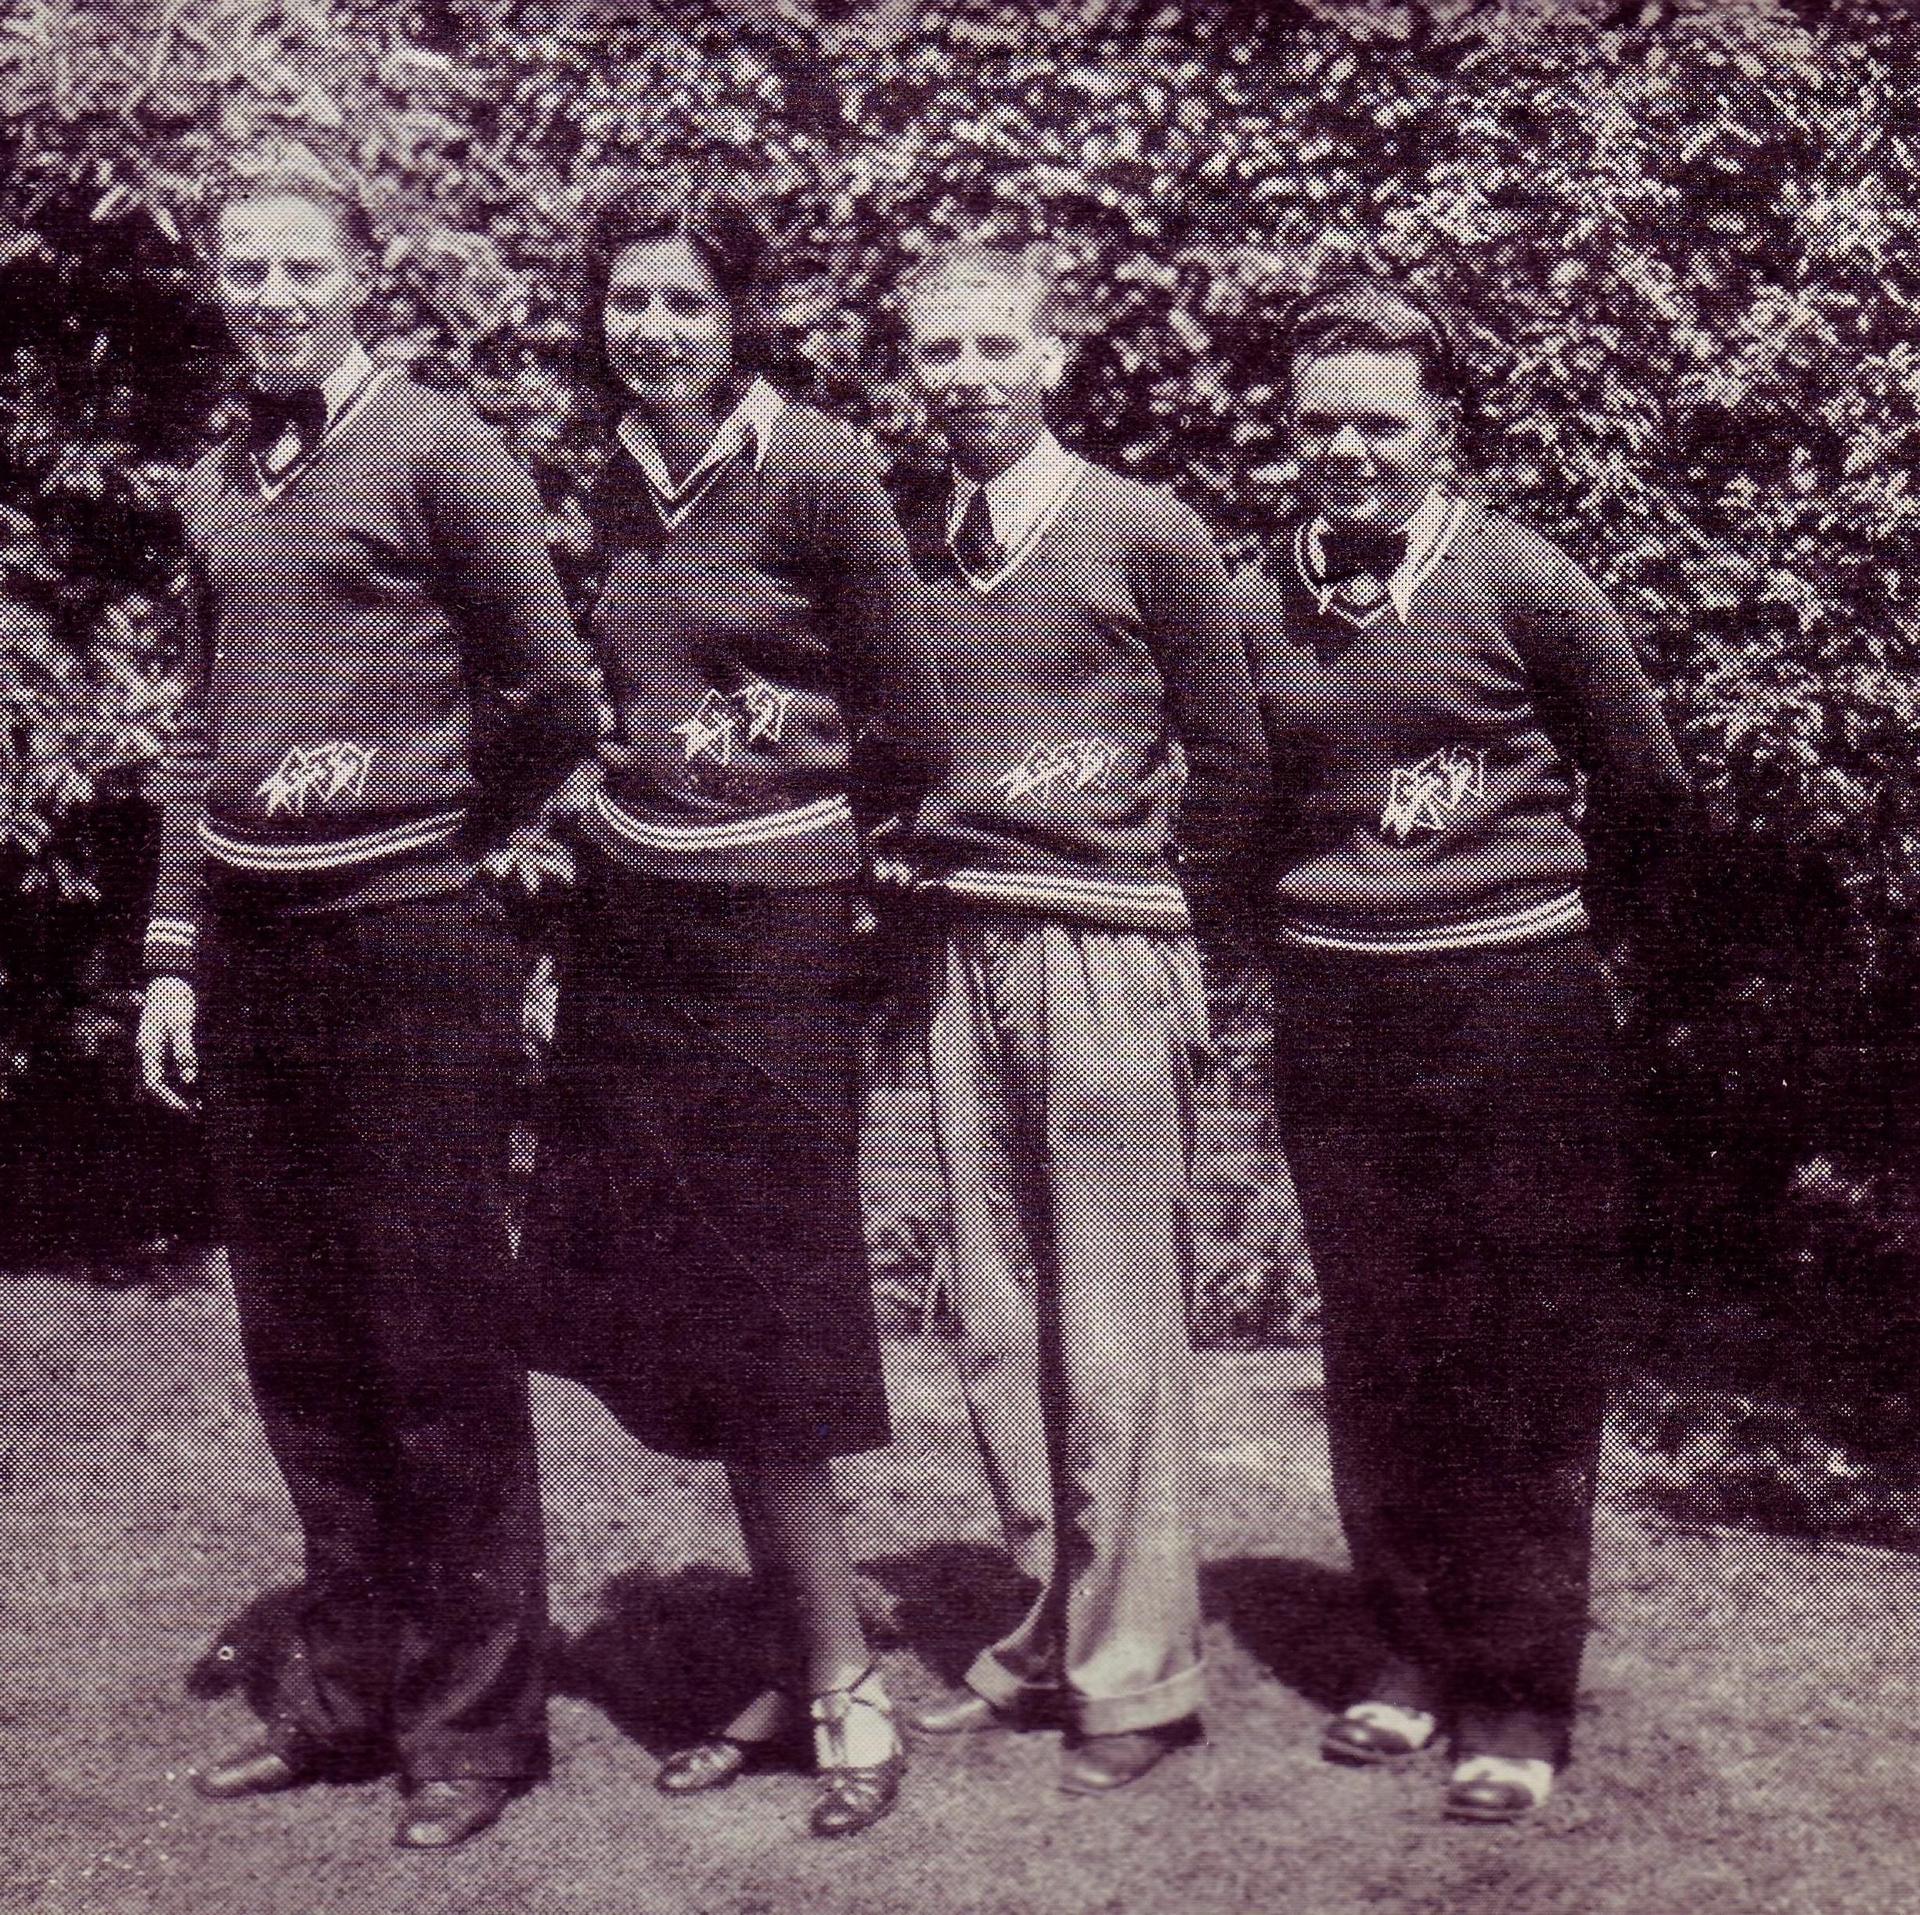 Ephebians of 1930